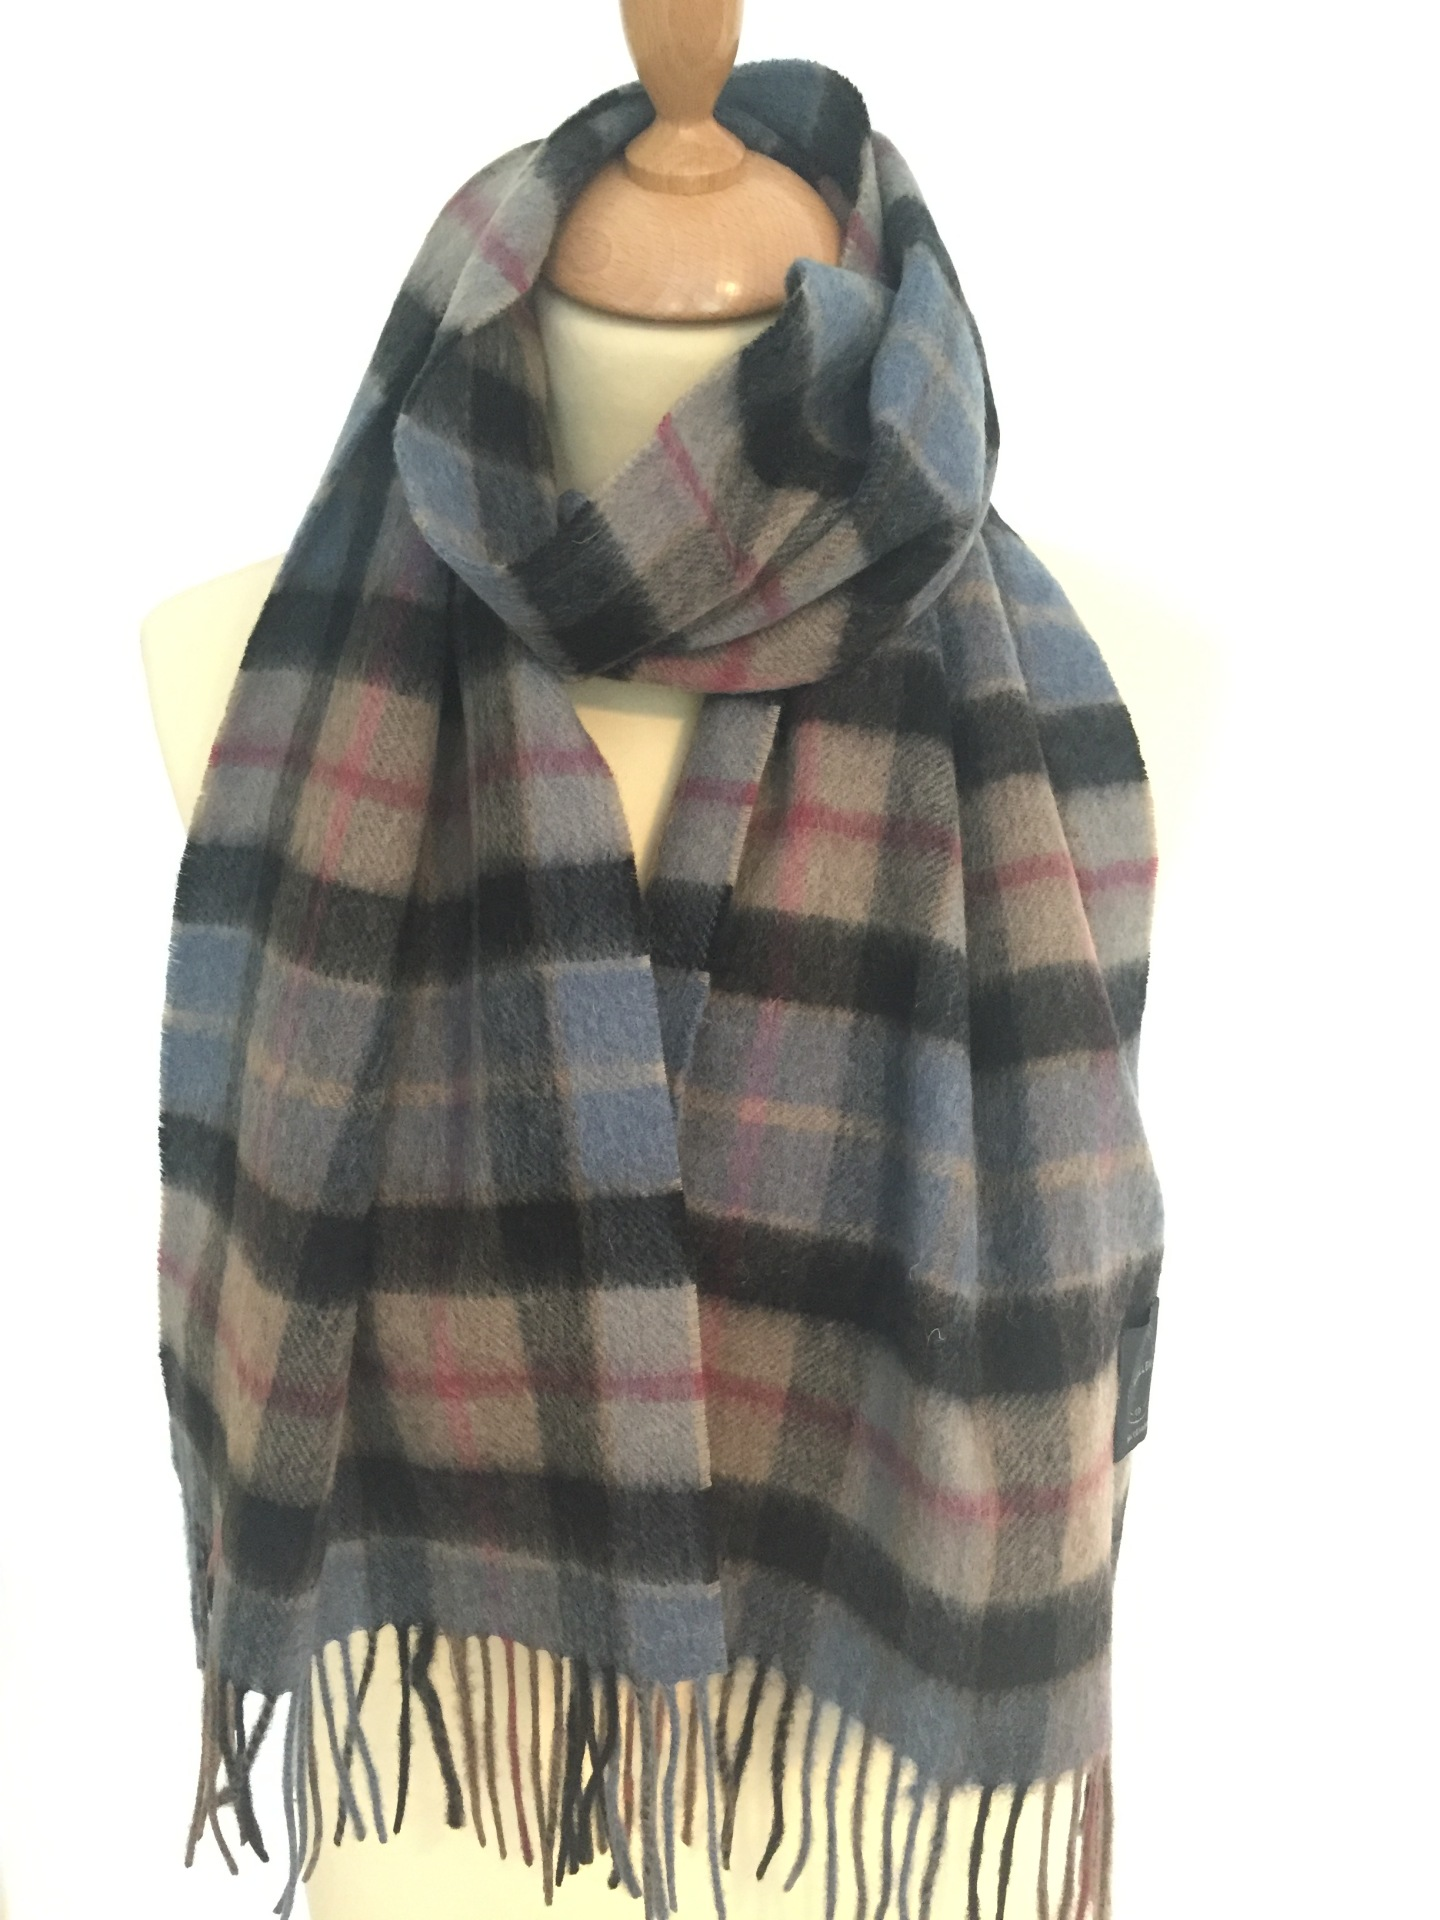 Blue/grey 804 Lambswool scarf